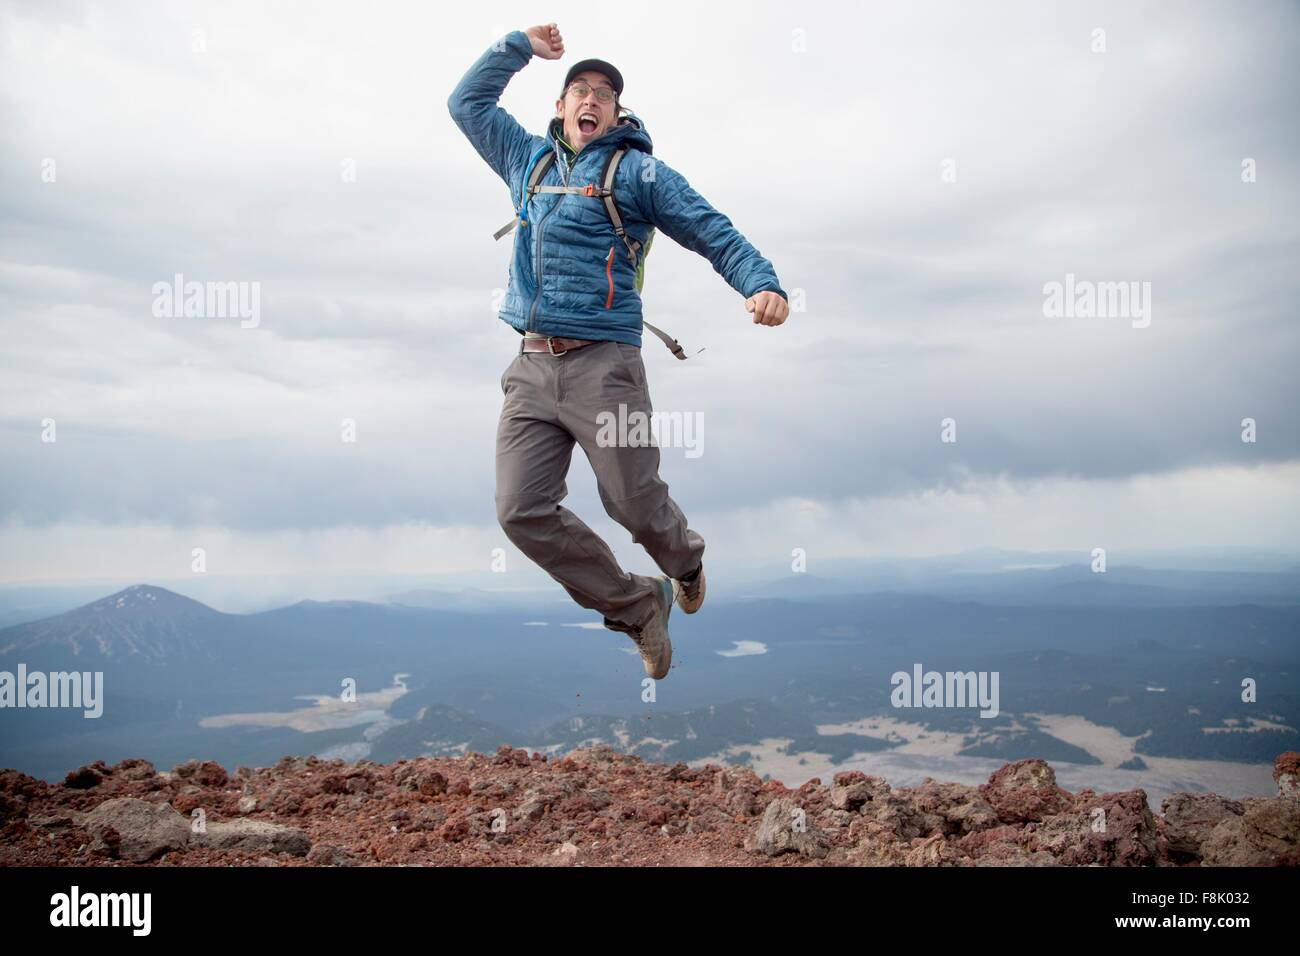 Joven salta de alegría en la cumbre del volcán, hermana de South Bend, Oregon, EE.UU. Imagen De Stock